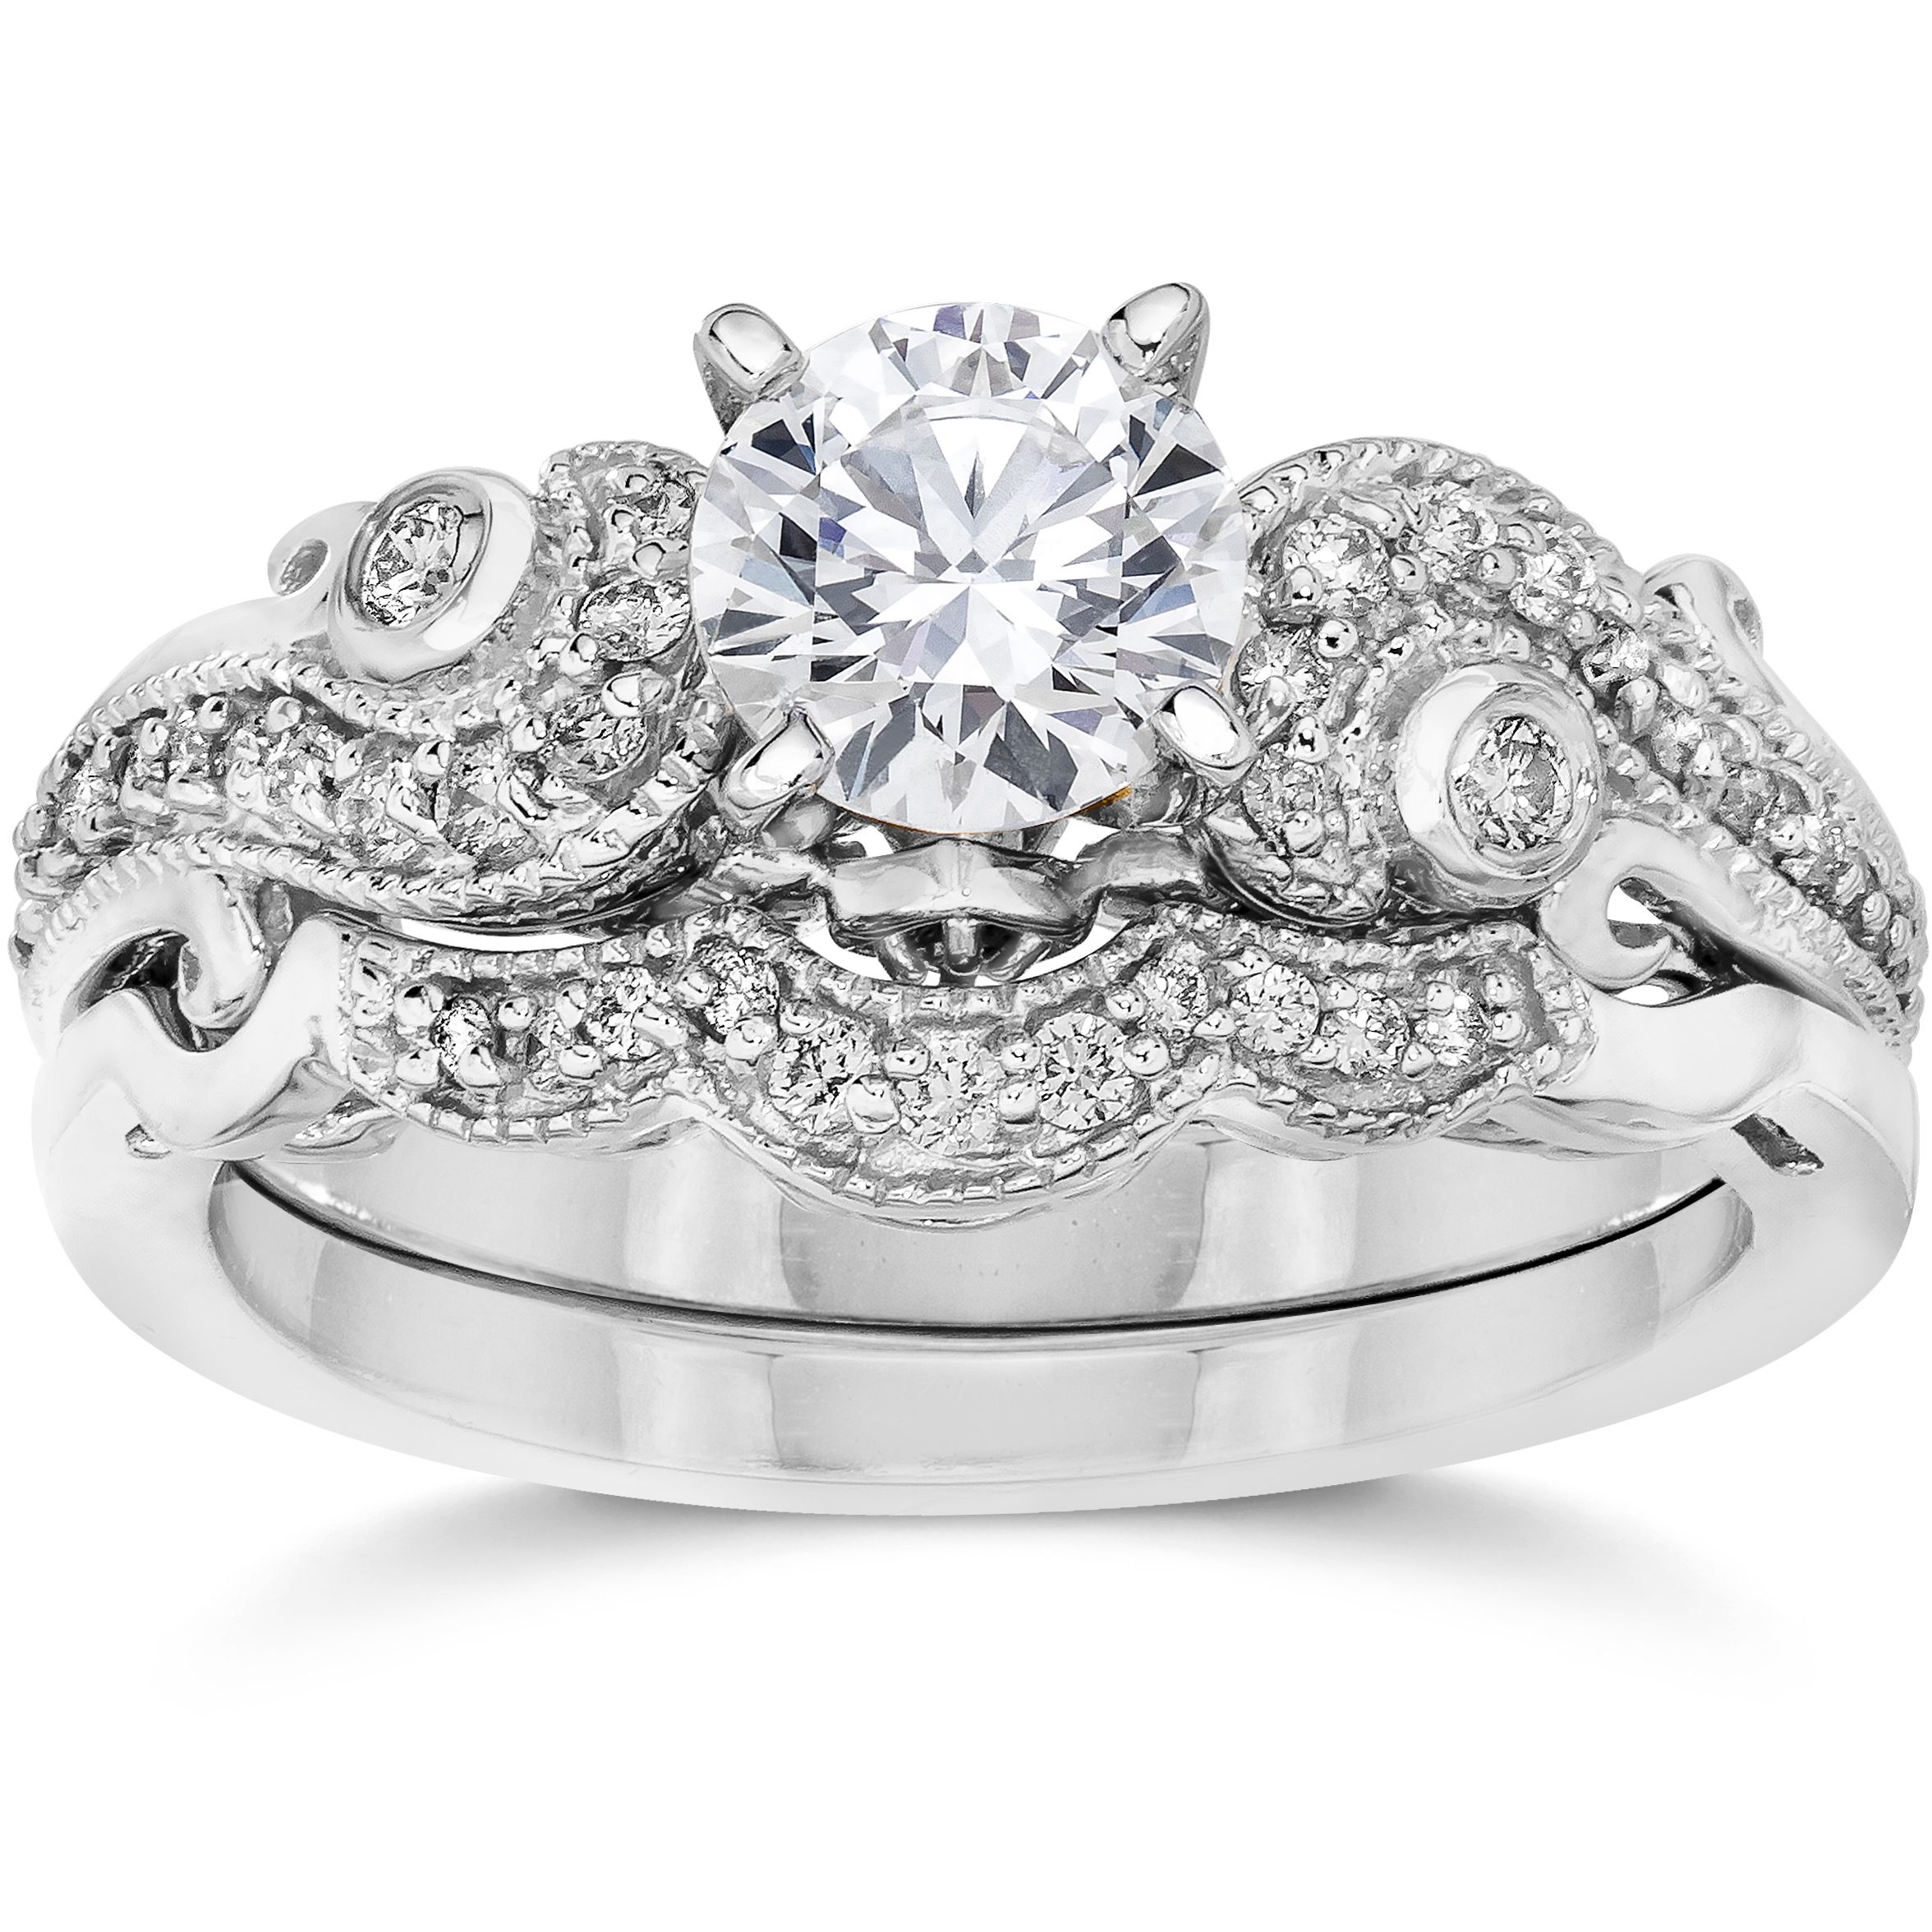 14+ Vintage diamond wedding ring ideas in 2021